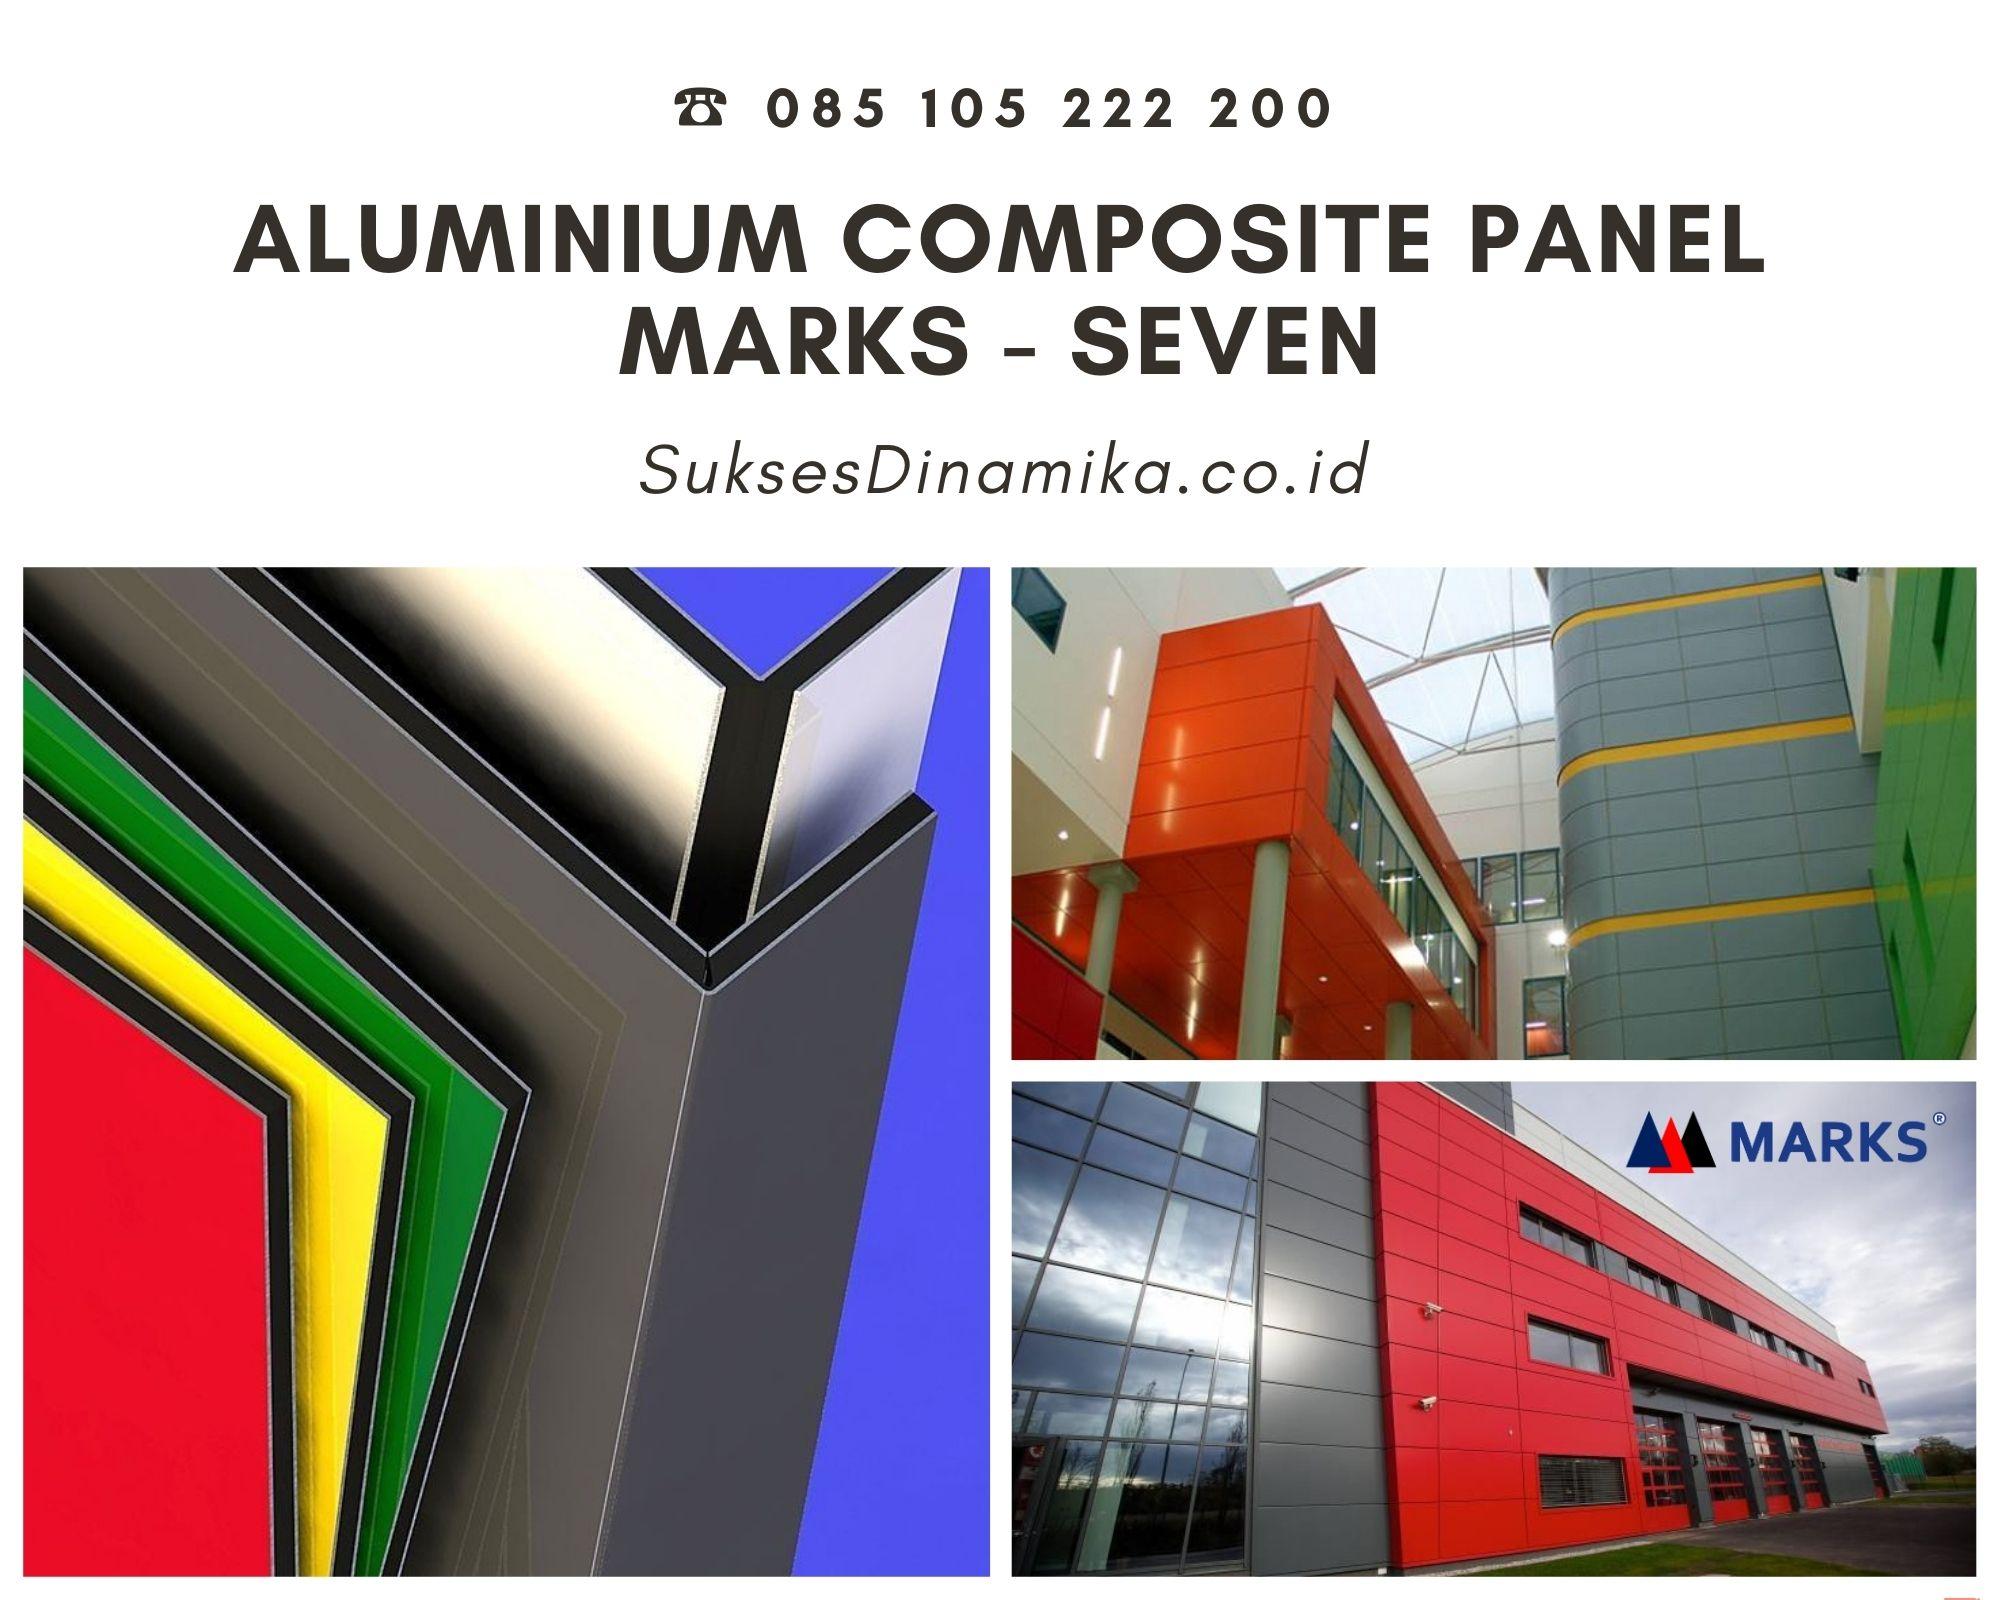 Jual Aluminium Composite Panel Marks Banyuwangi